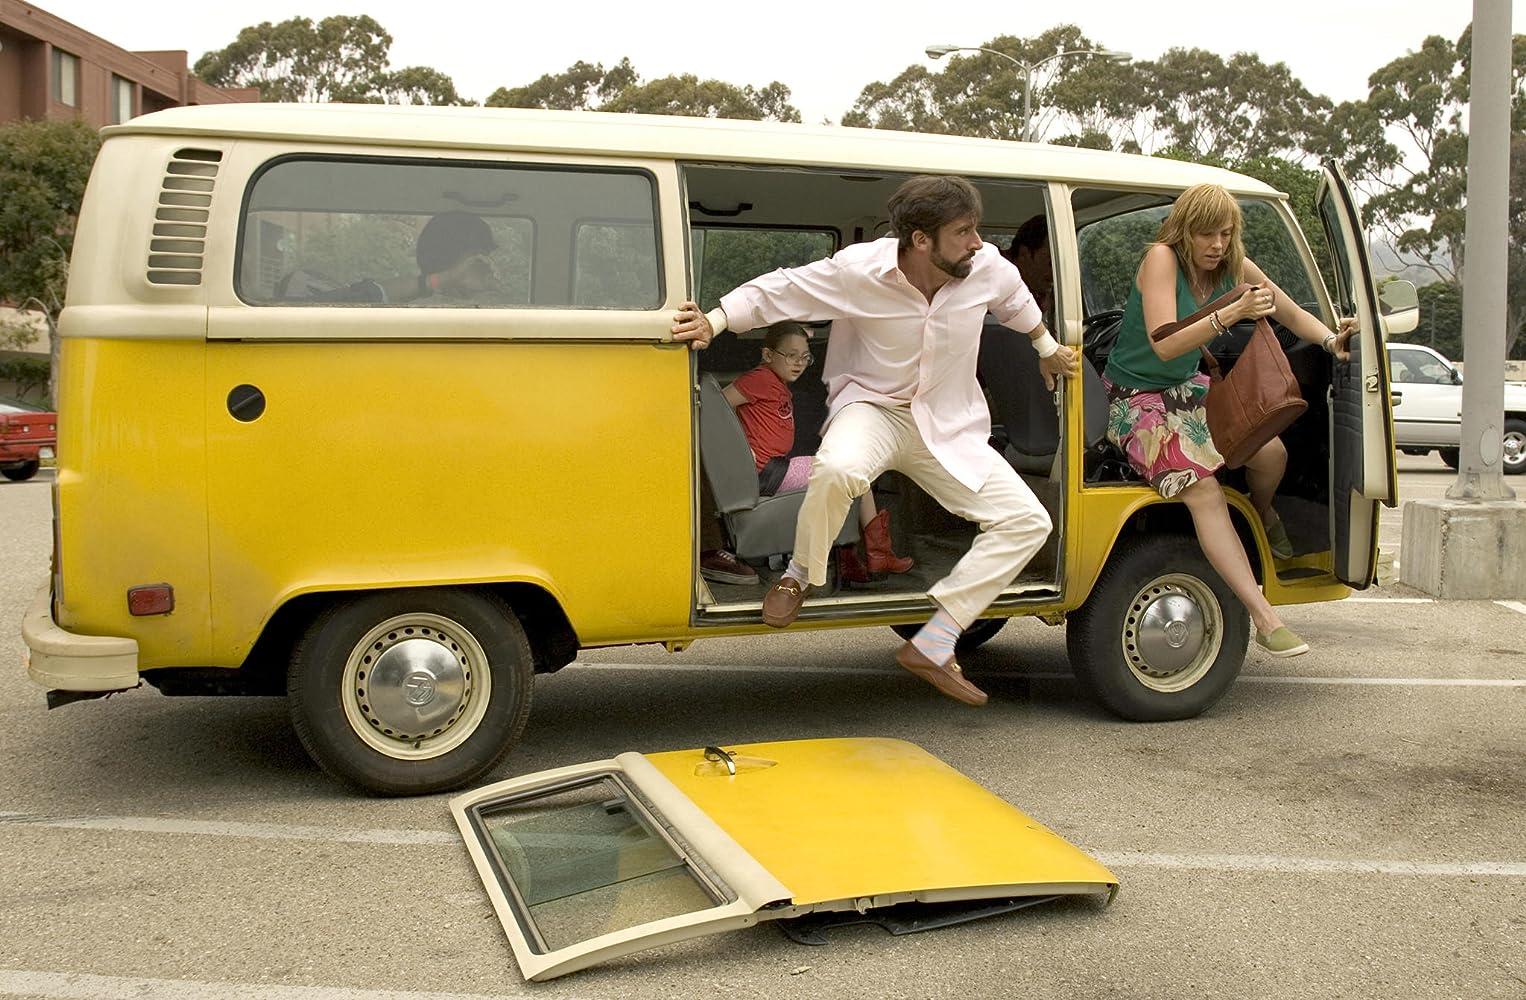 Toni Collette, Steve Carell, and Abigail Breslin in Little Miss Sunshine (2006)